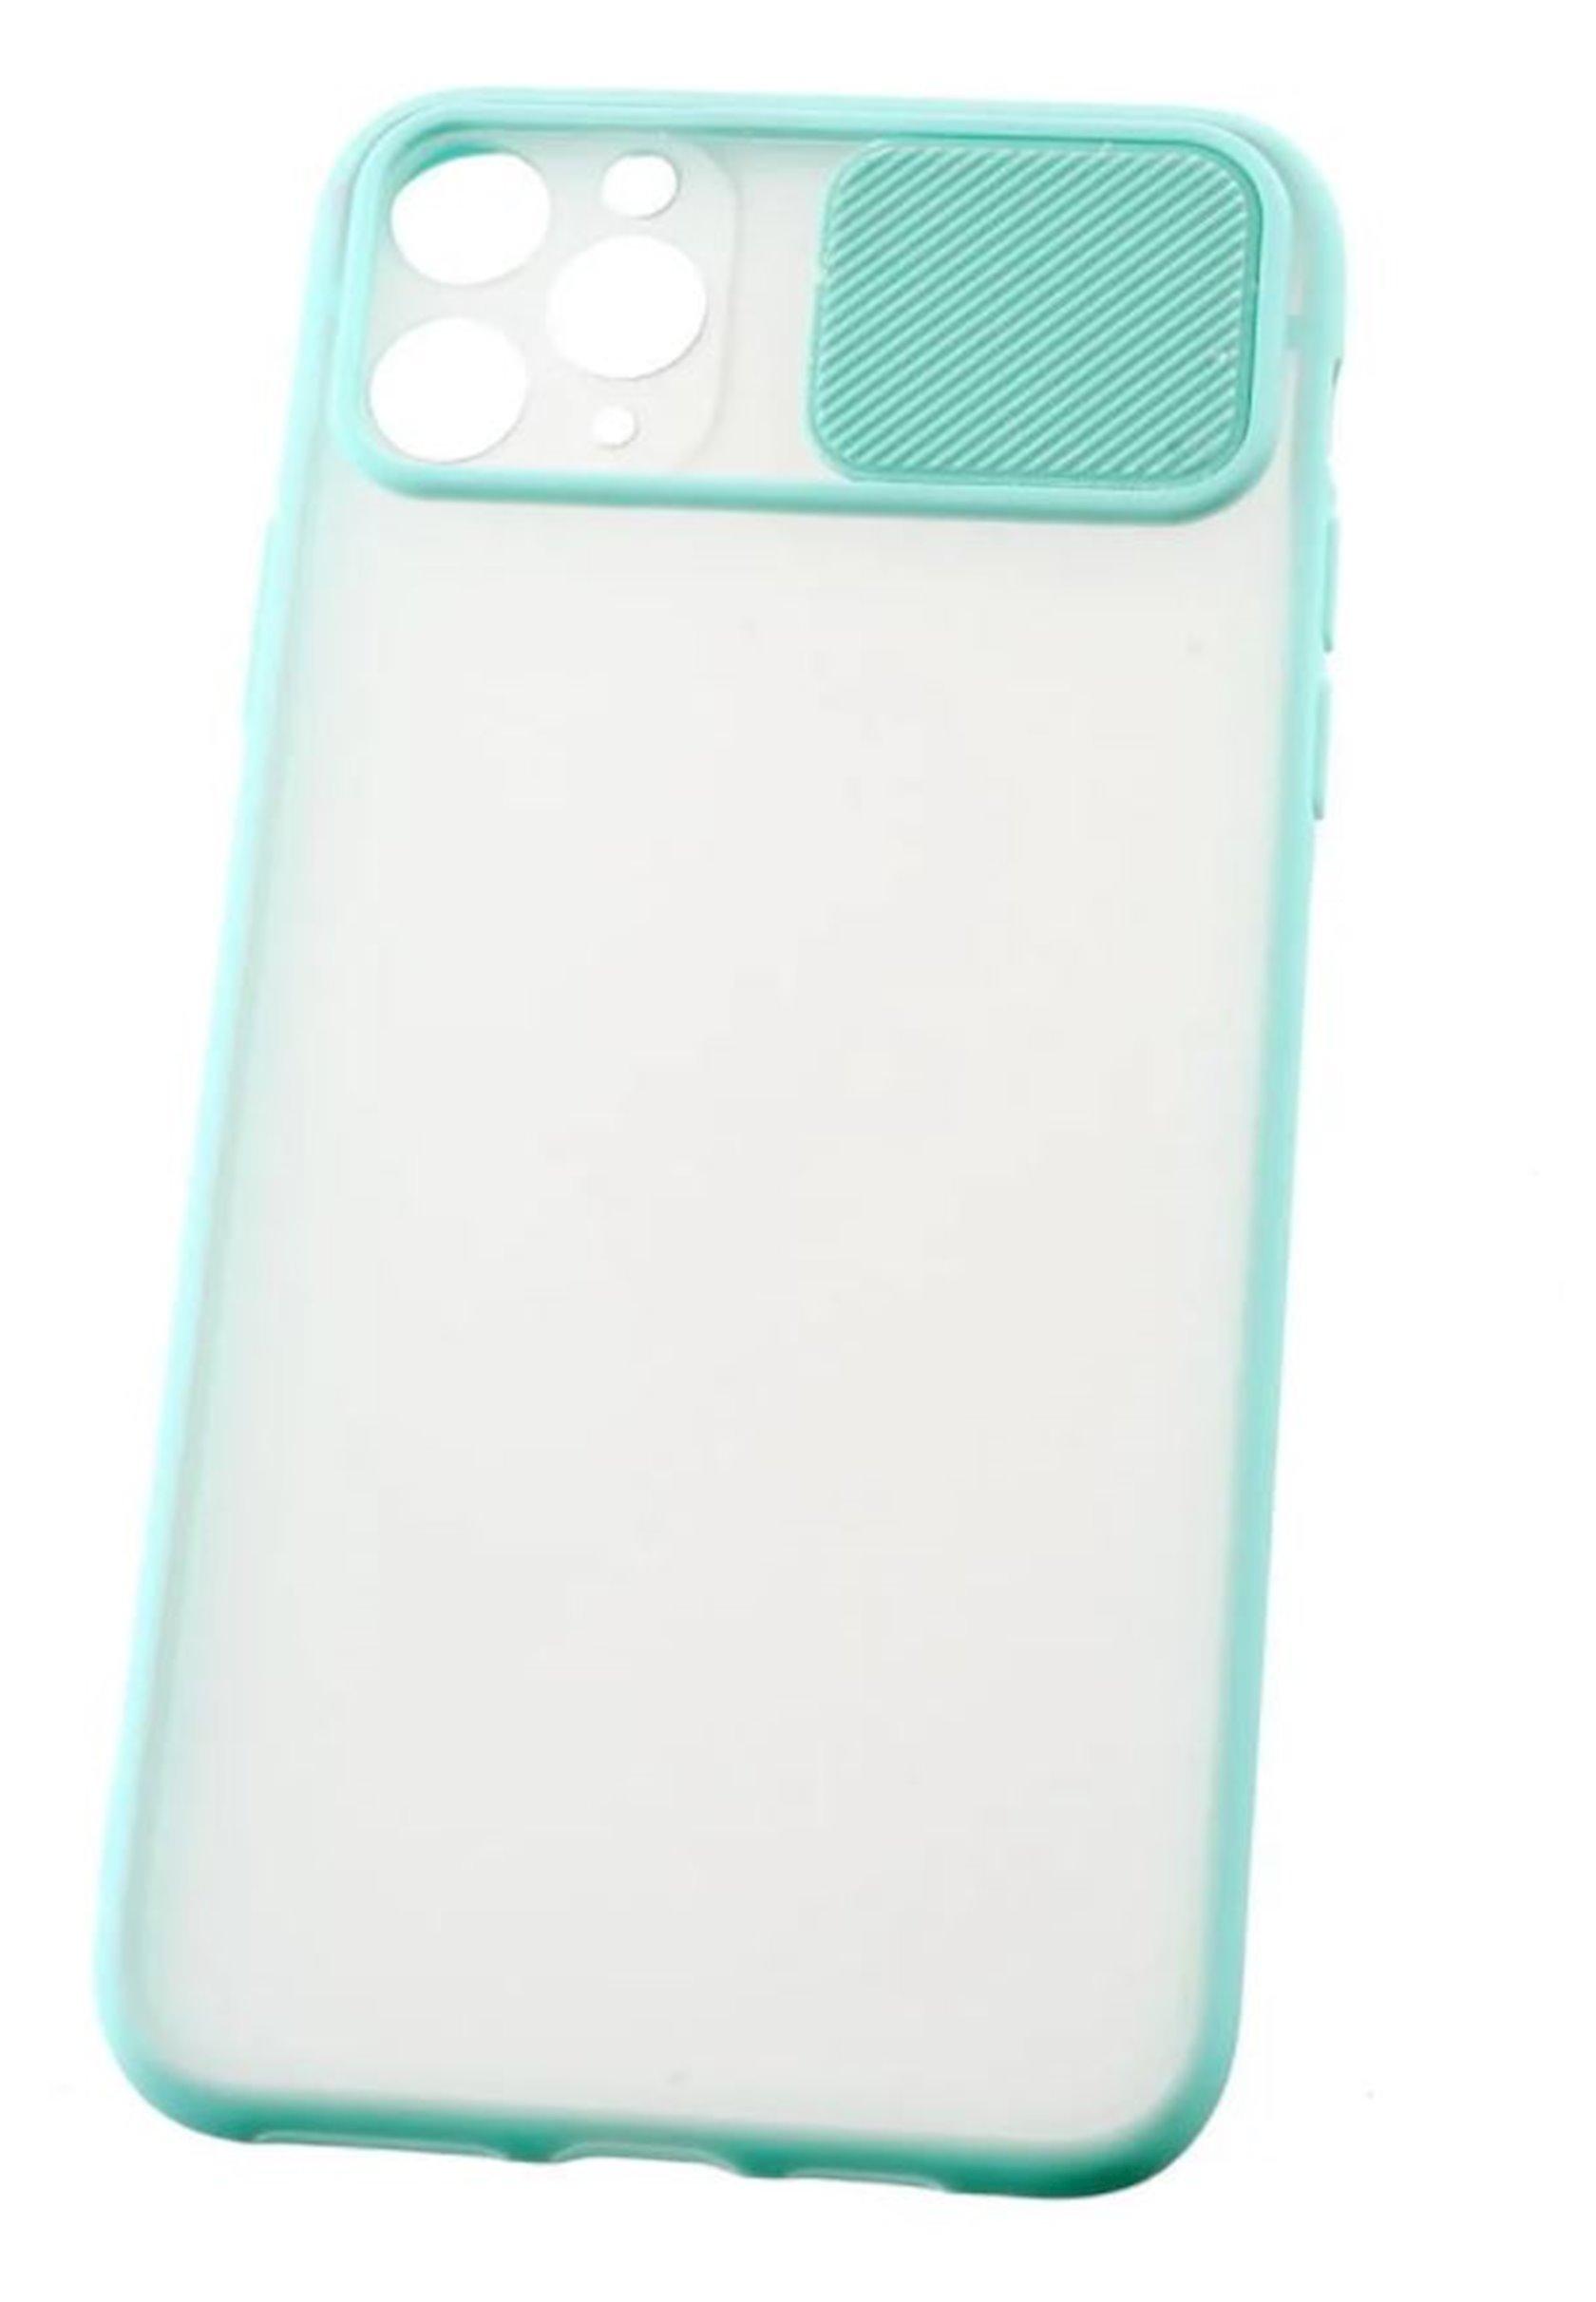 Çexol YO Camshield Color Apple iPhone 11 Pro Max üçün Light Blue